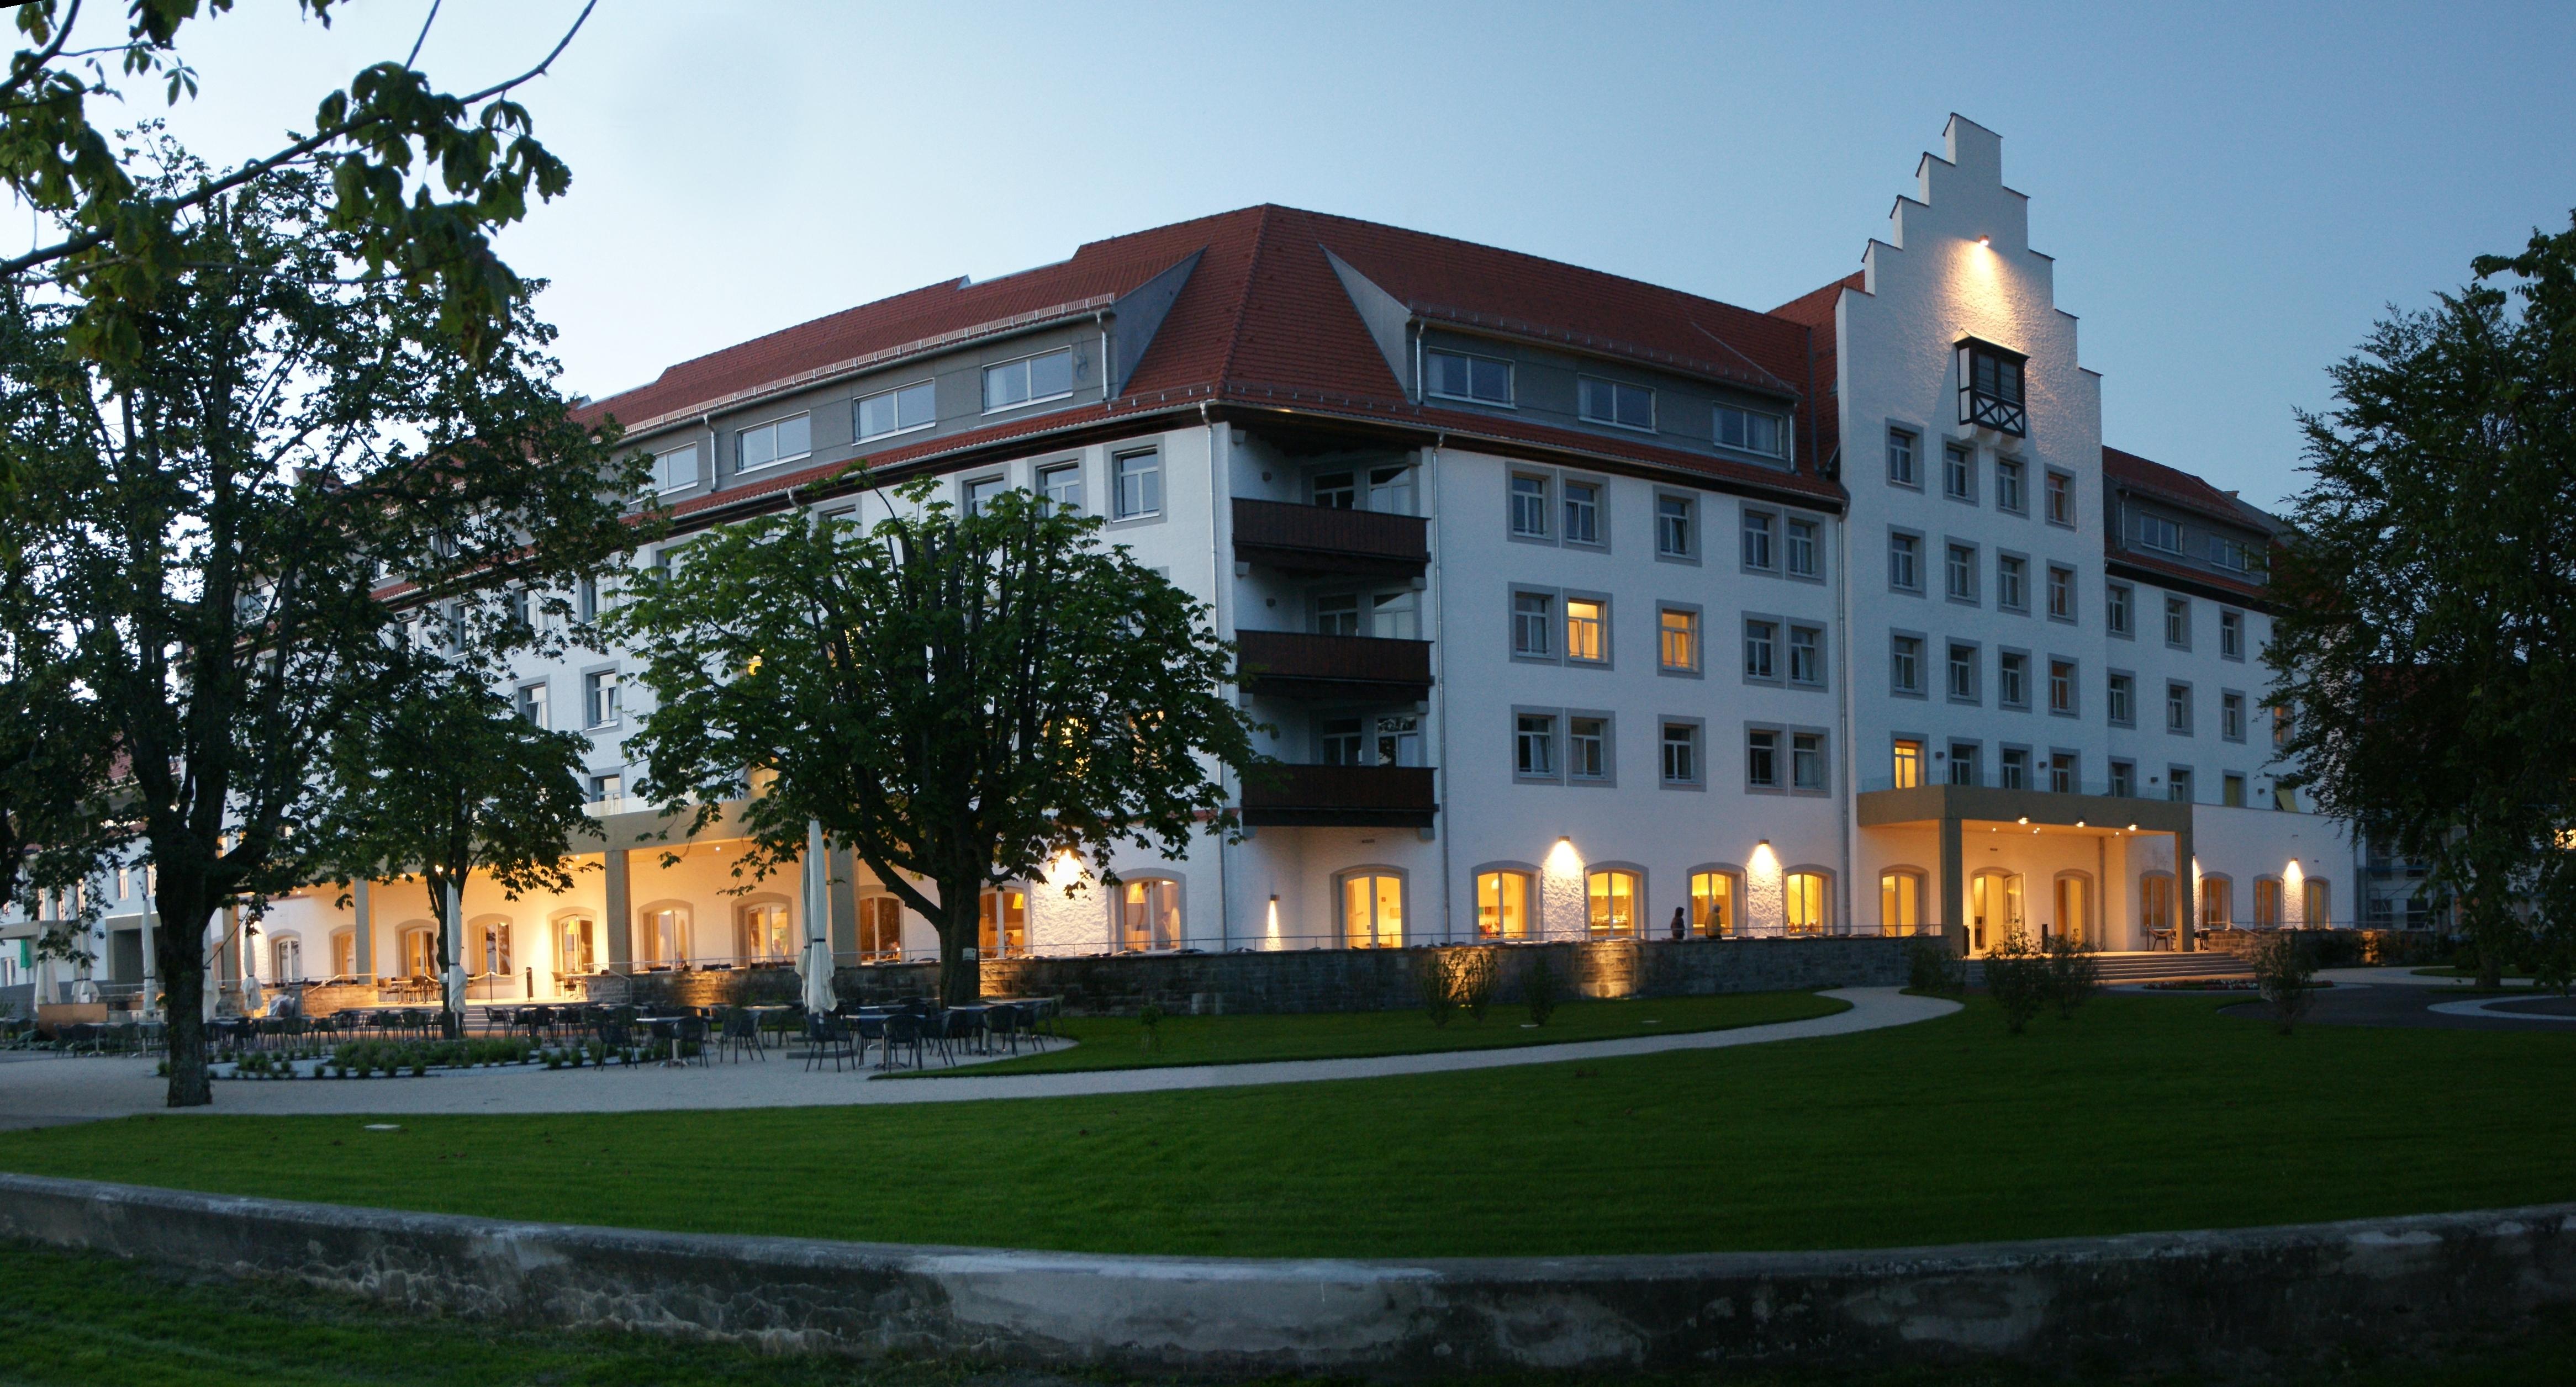 Seehotel Kaiserstrand